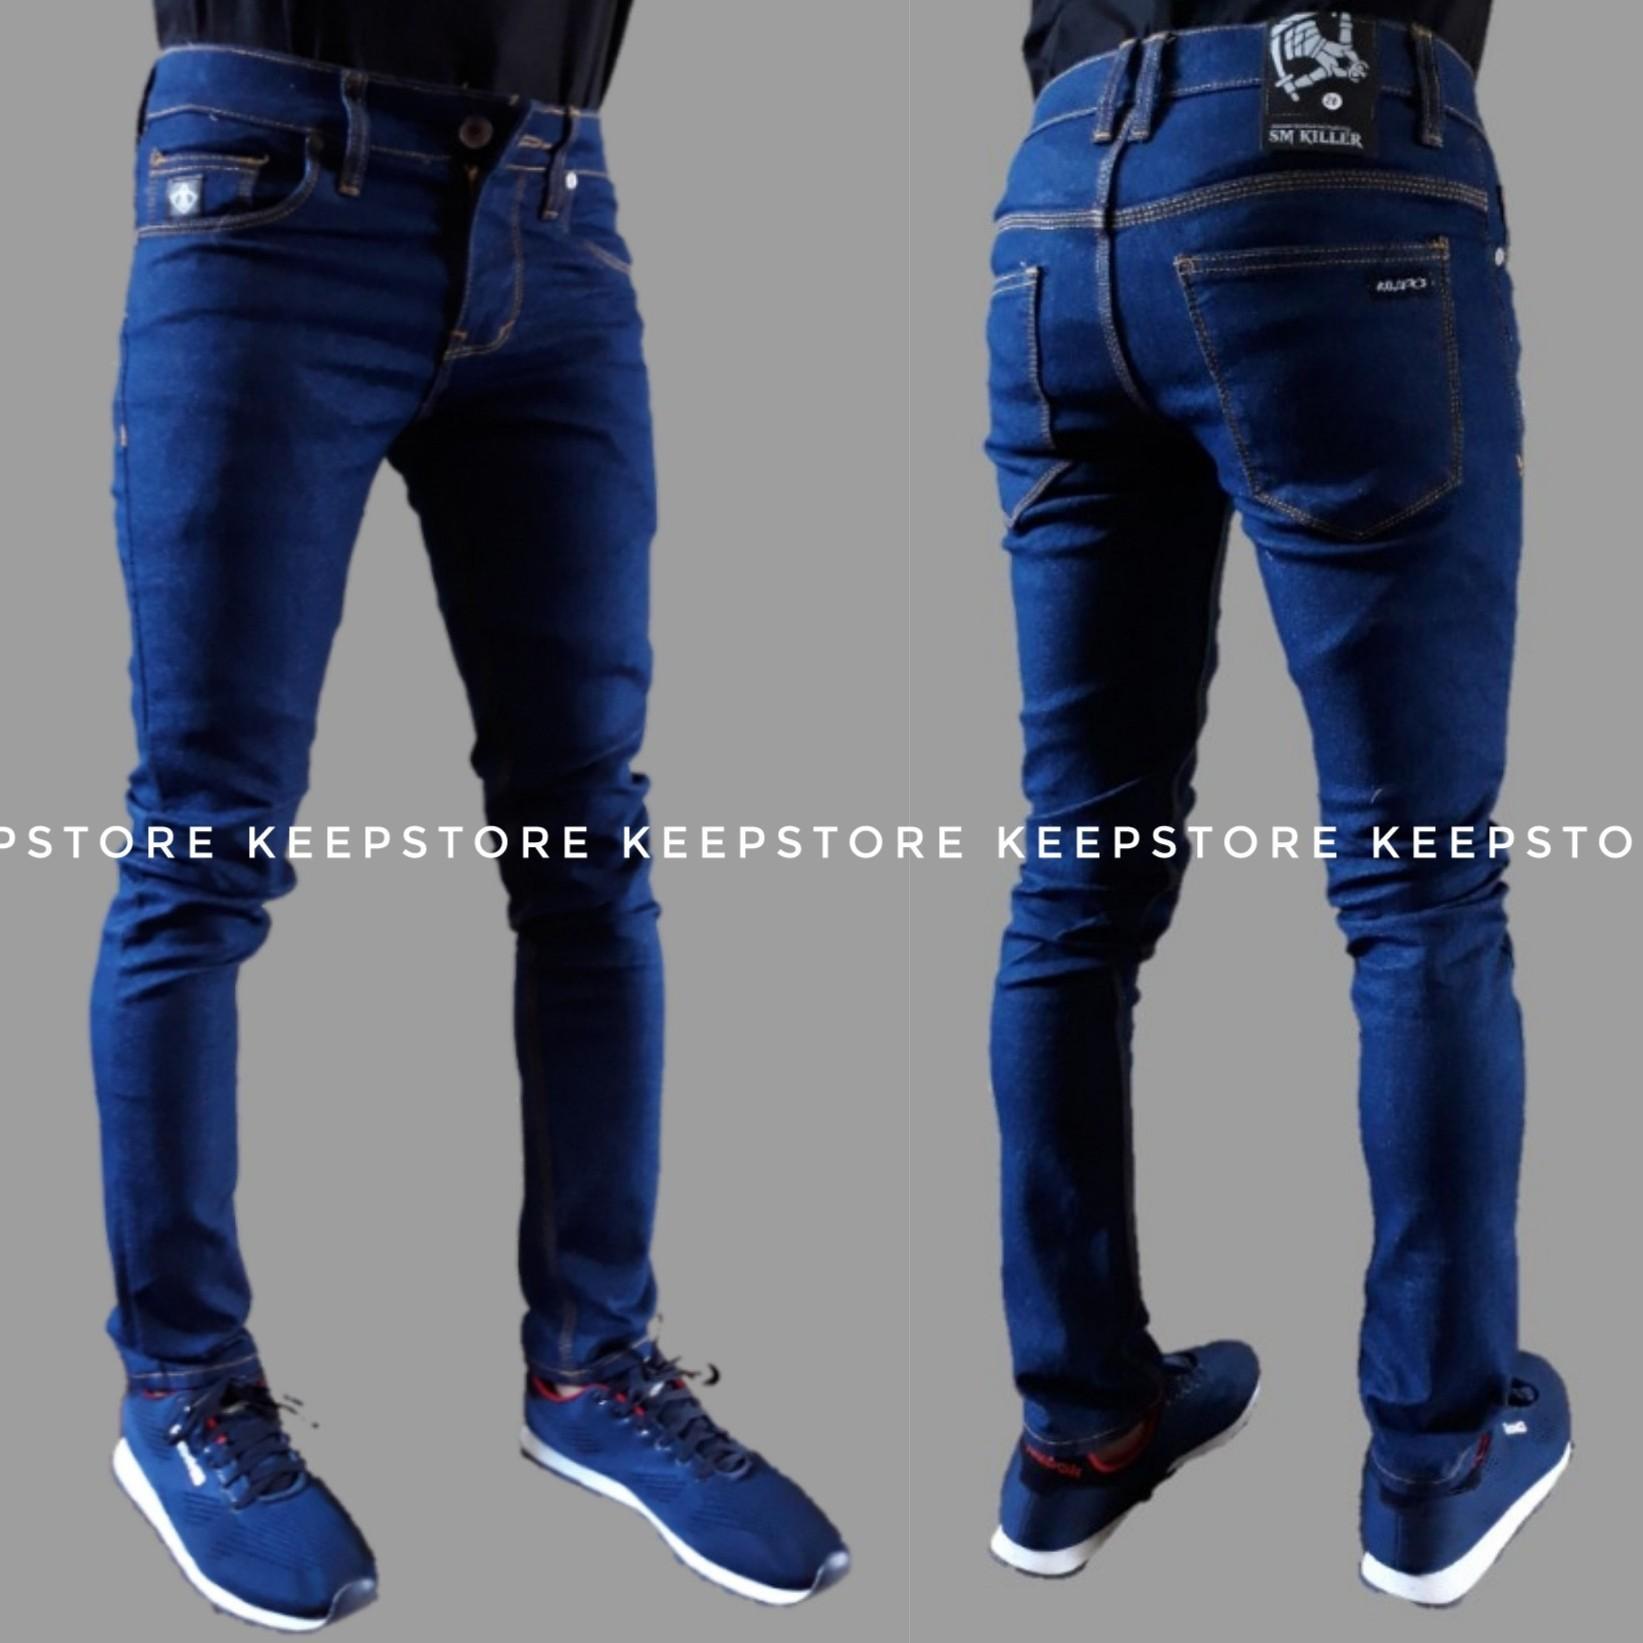 Celana Jeans Pria Branded Terbaik Cardinal Formal Slim Fit Office Pants Abu 32 Skinny Slimfit Pensil Biru Navy